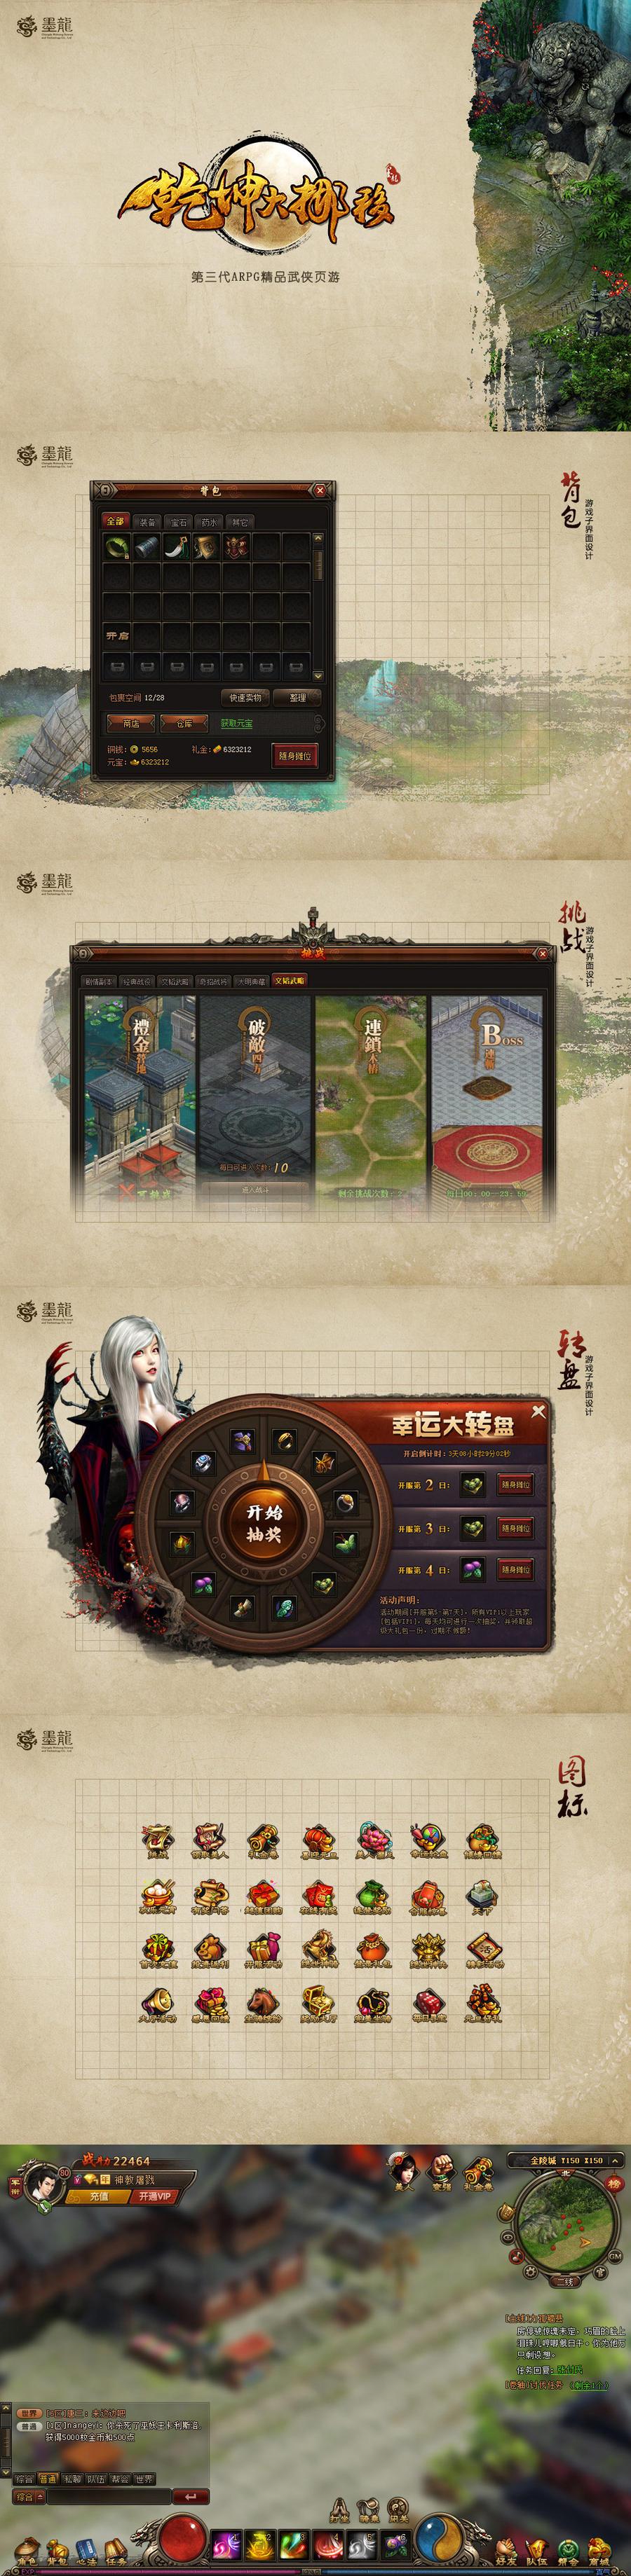 qiankundanuoyi by nangeyi